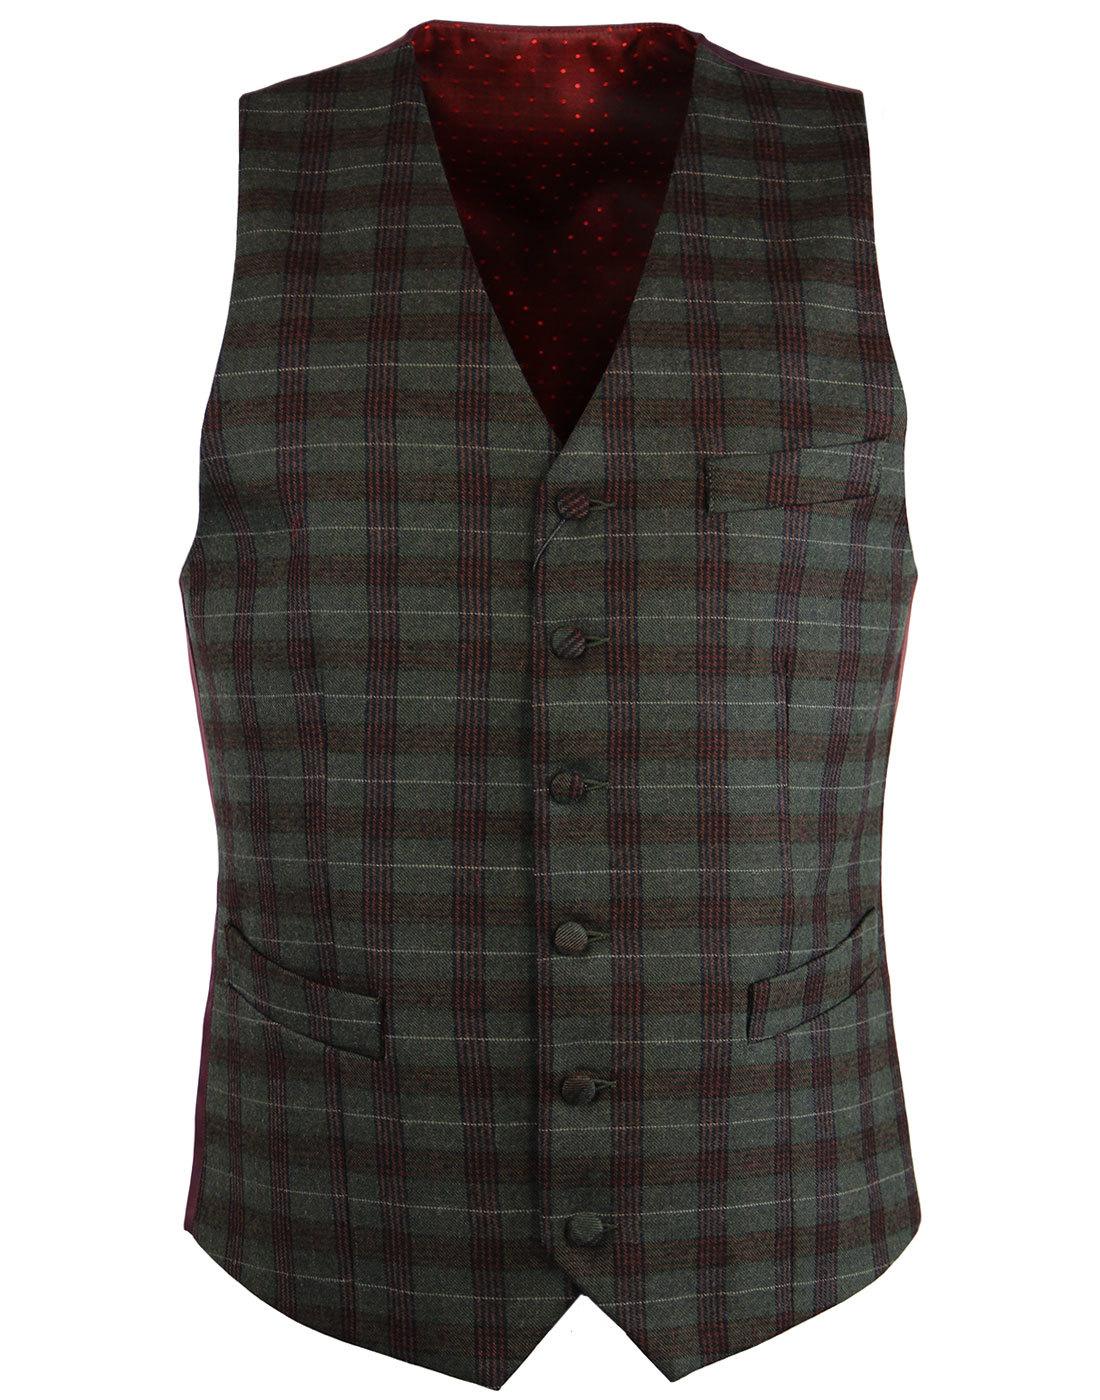 GABICCI VINTAGE 60s Mod Check V-Neck Waistcoat